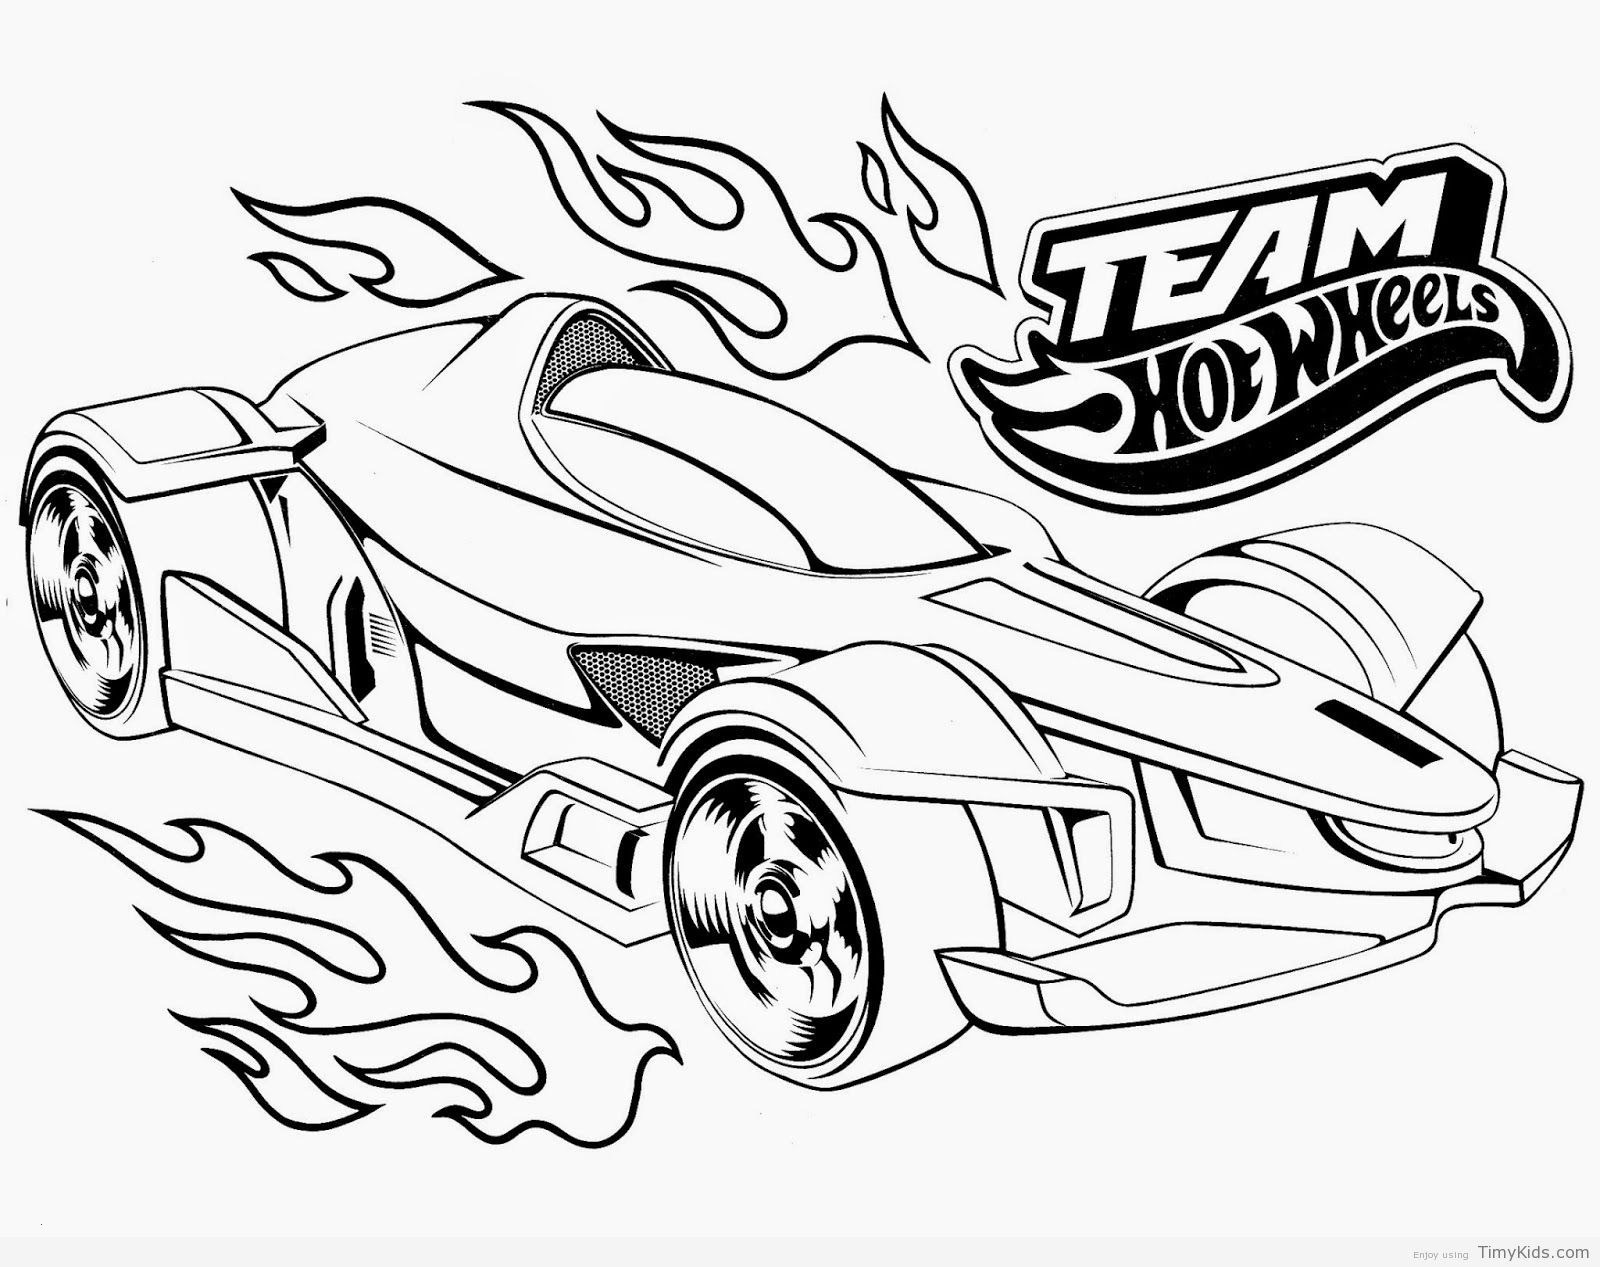 Malvorlage Lightning Mcqueen Inspirierend Awesome Colouring Disney Cars Genial Cars Ausmalbilder Lightning Stock